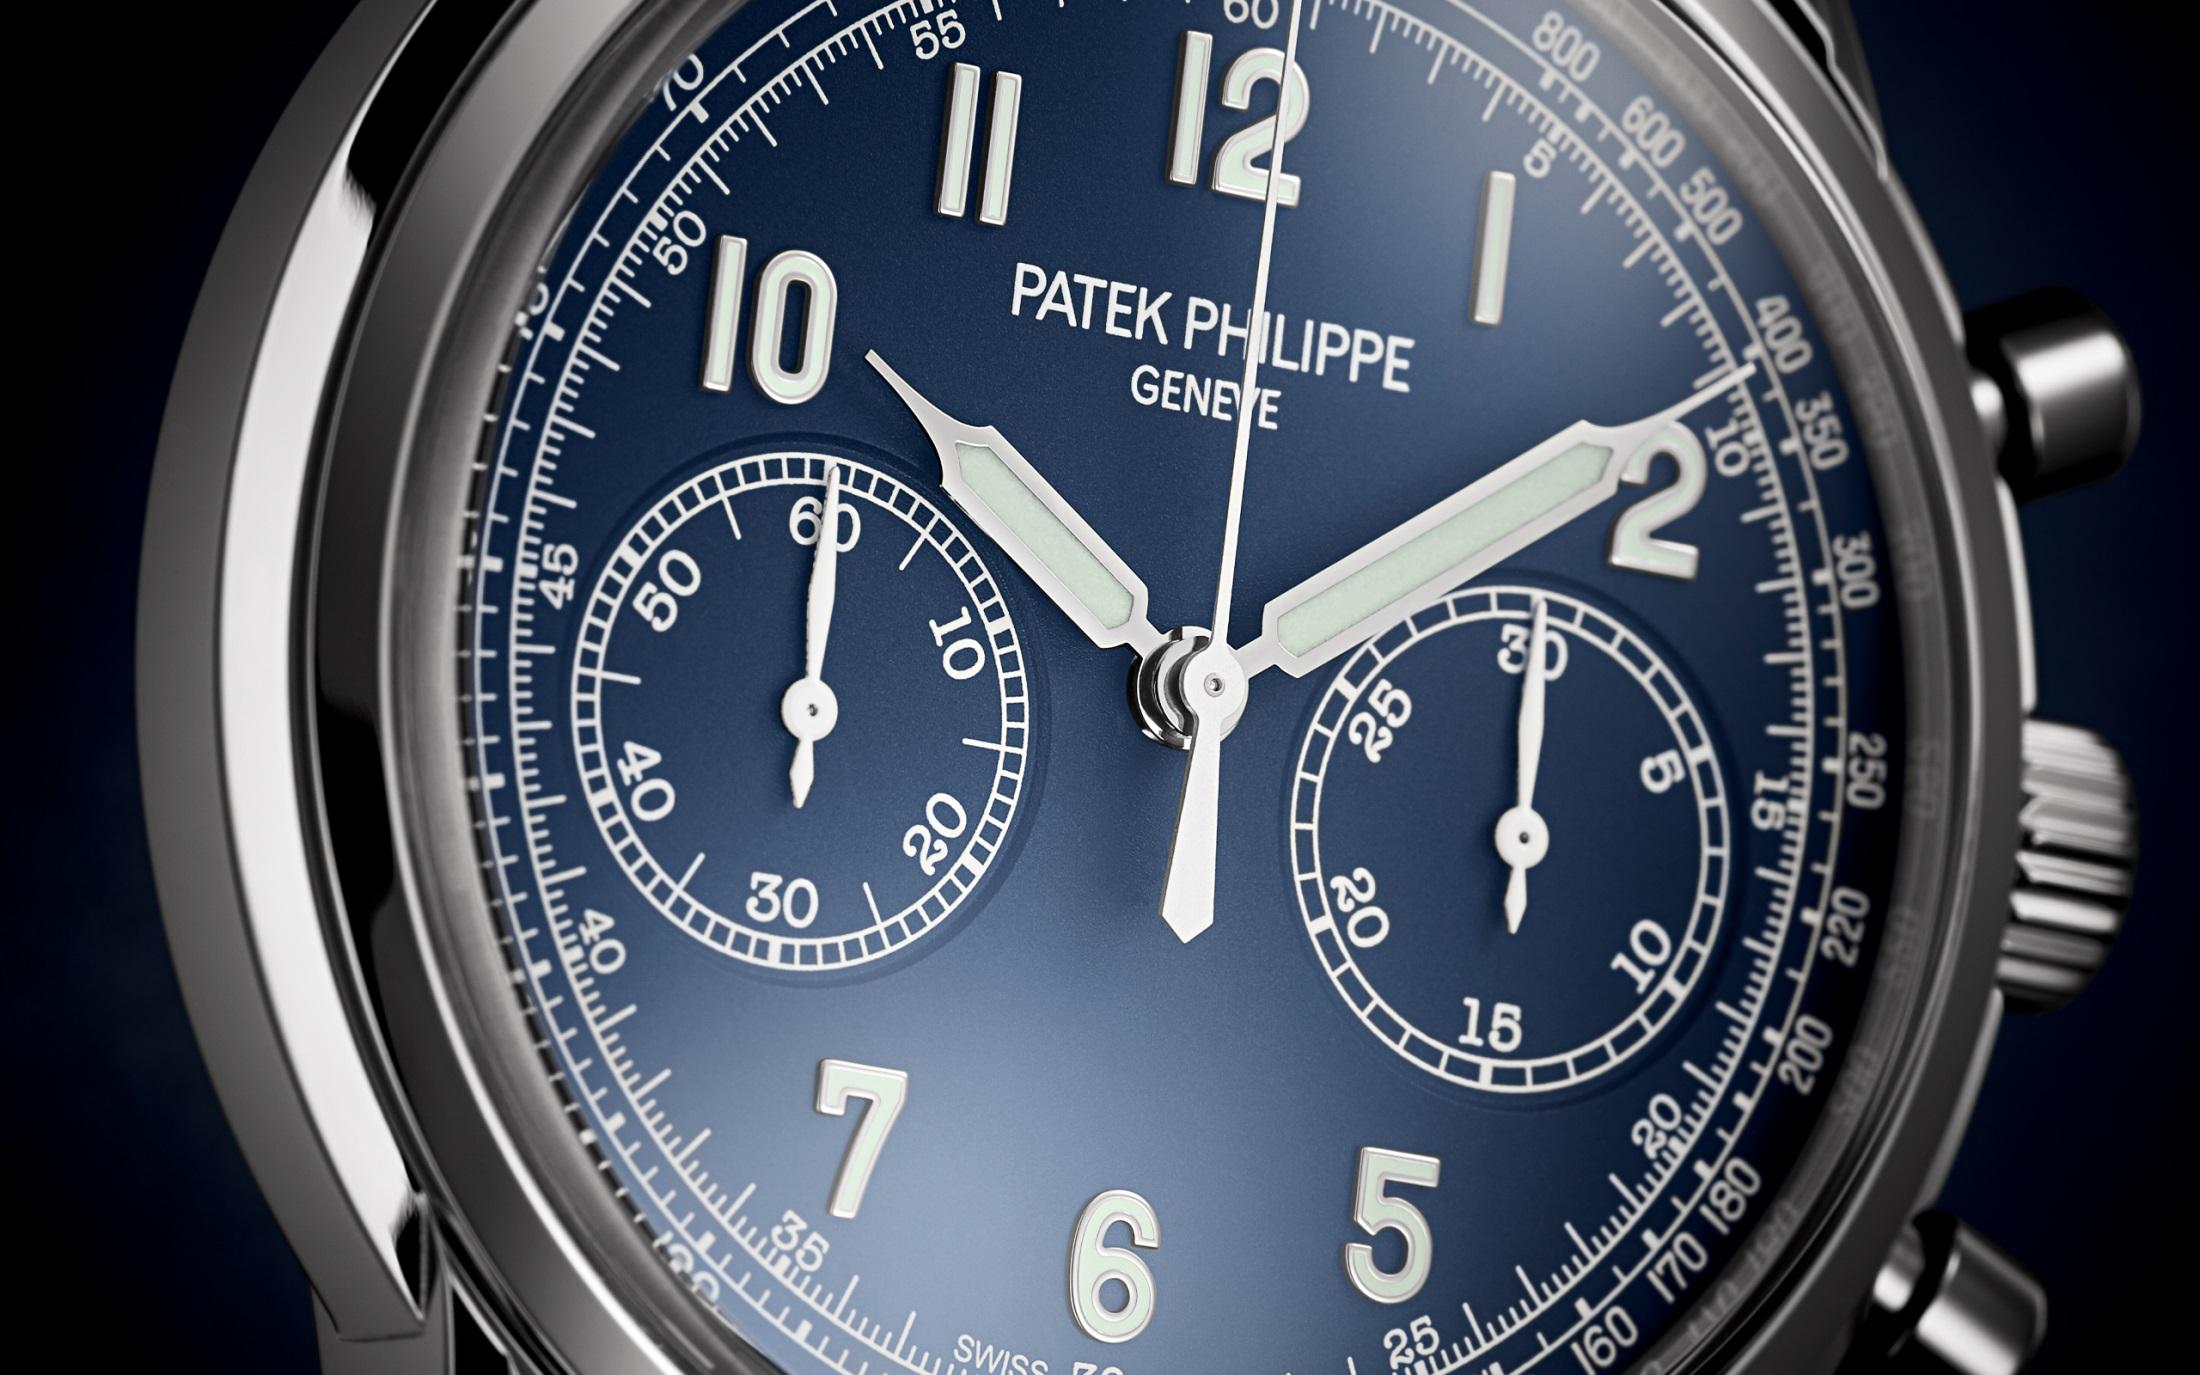 Patek Philippe Chronograph 5172G Baselworld 2019